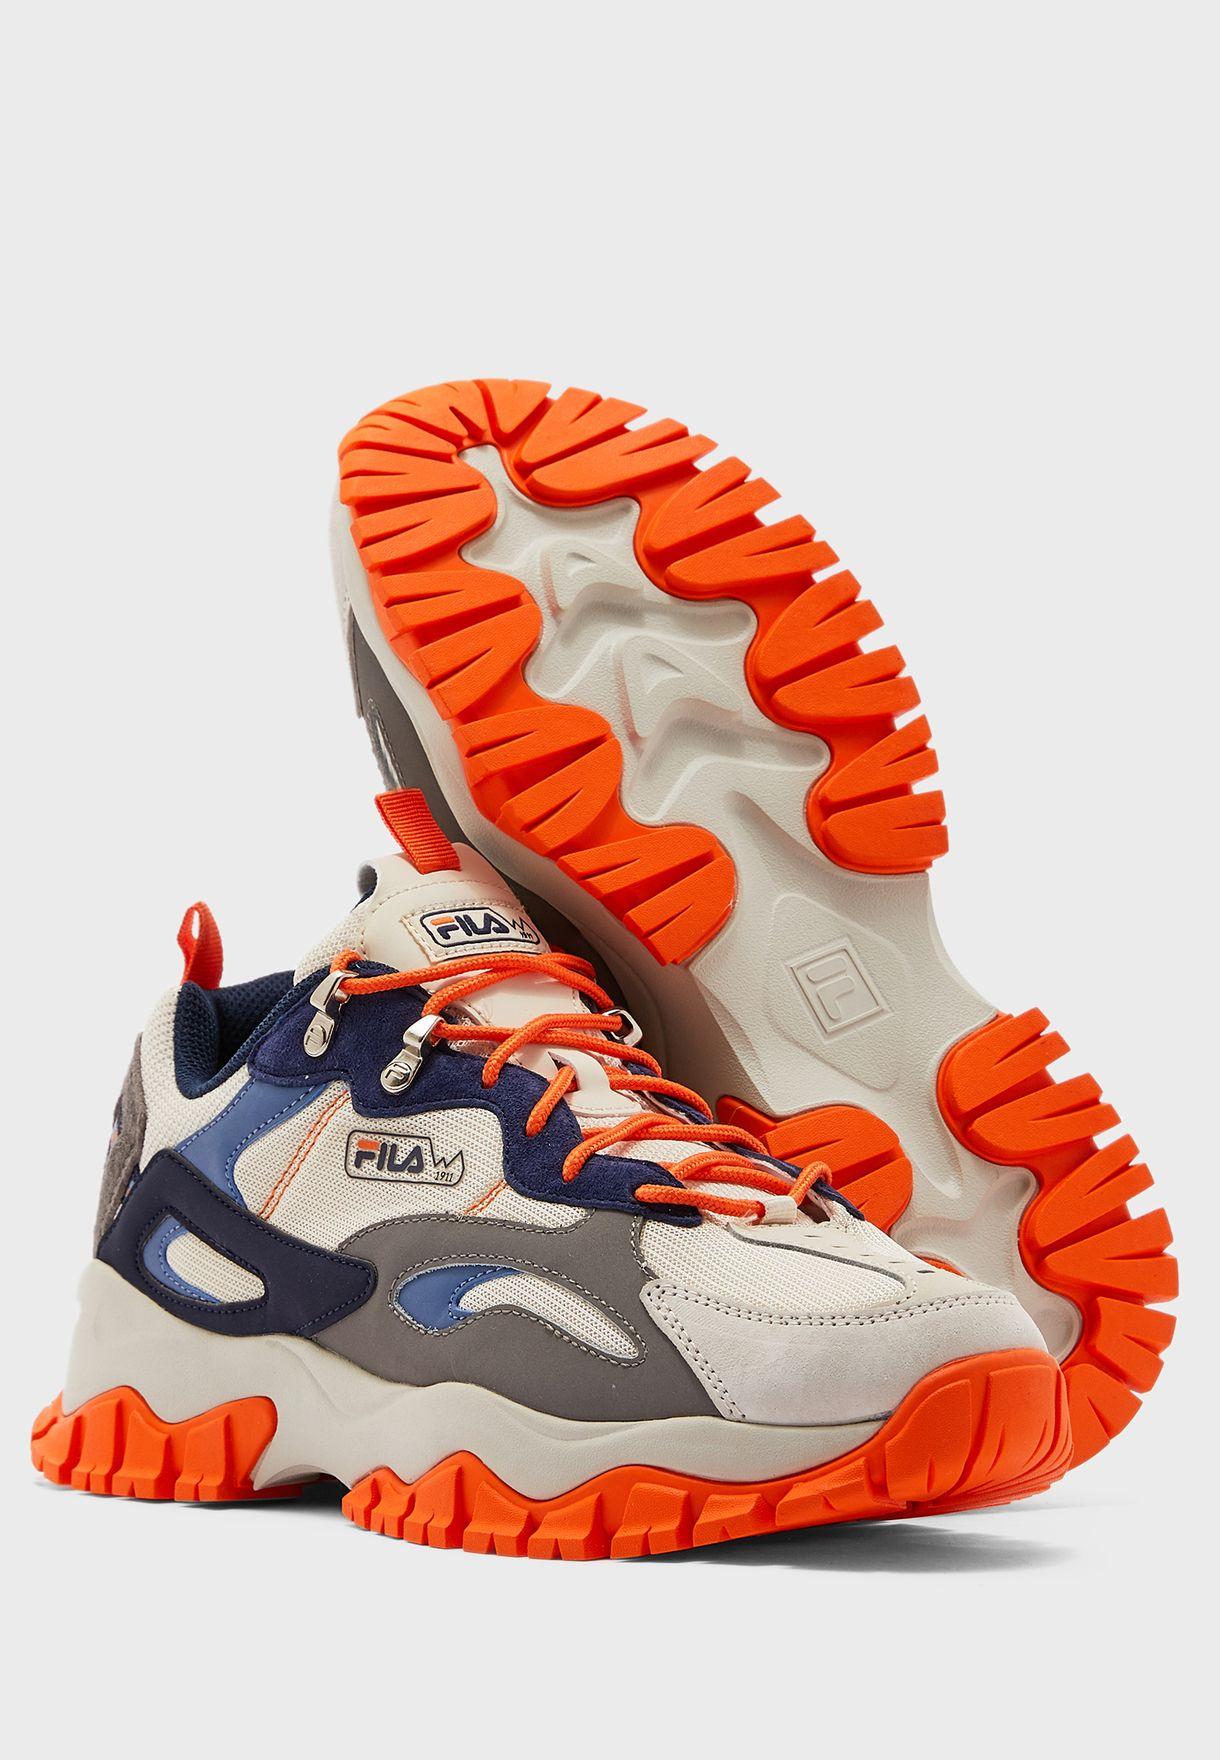 حذاء راي تريسر تي ار 2